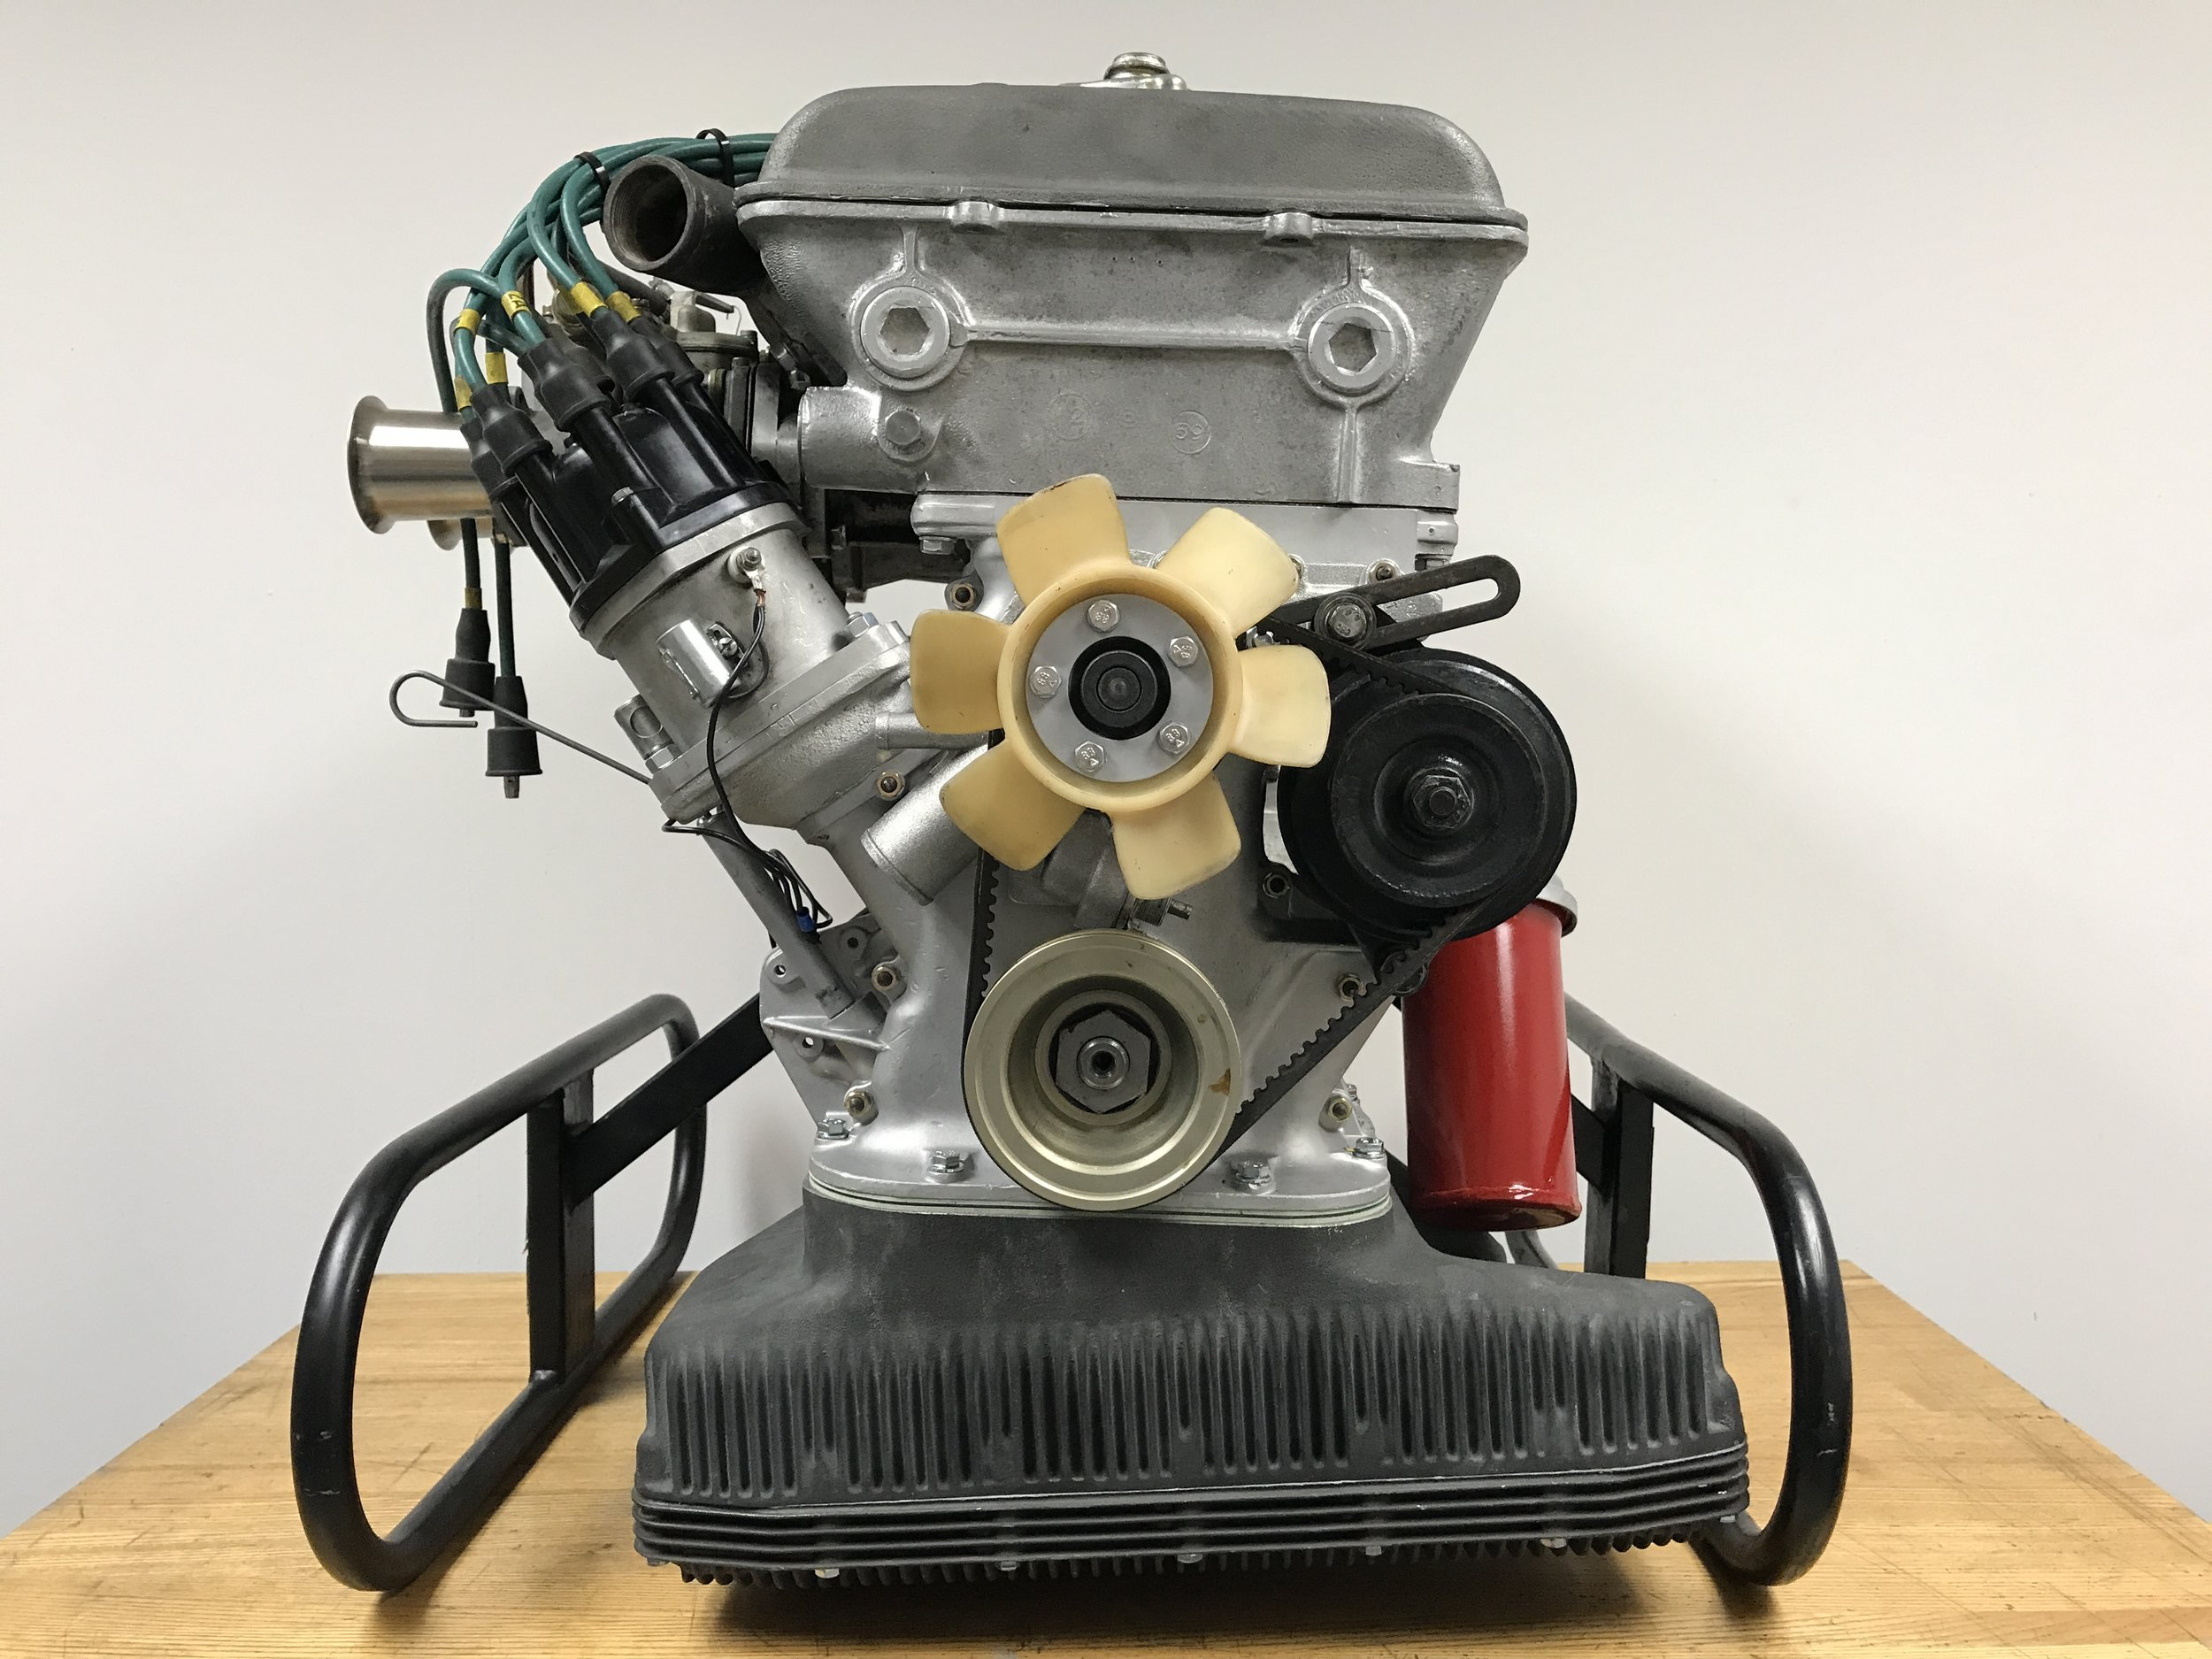 1965 Alfa Romeo GTA 1600 engine prepared for 2017 Monterey Historics.